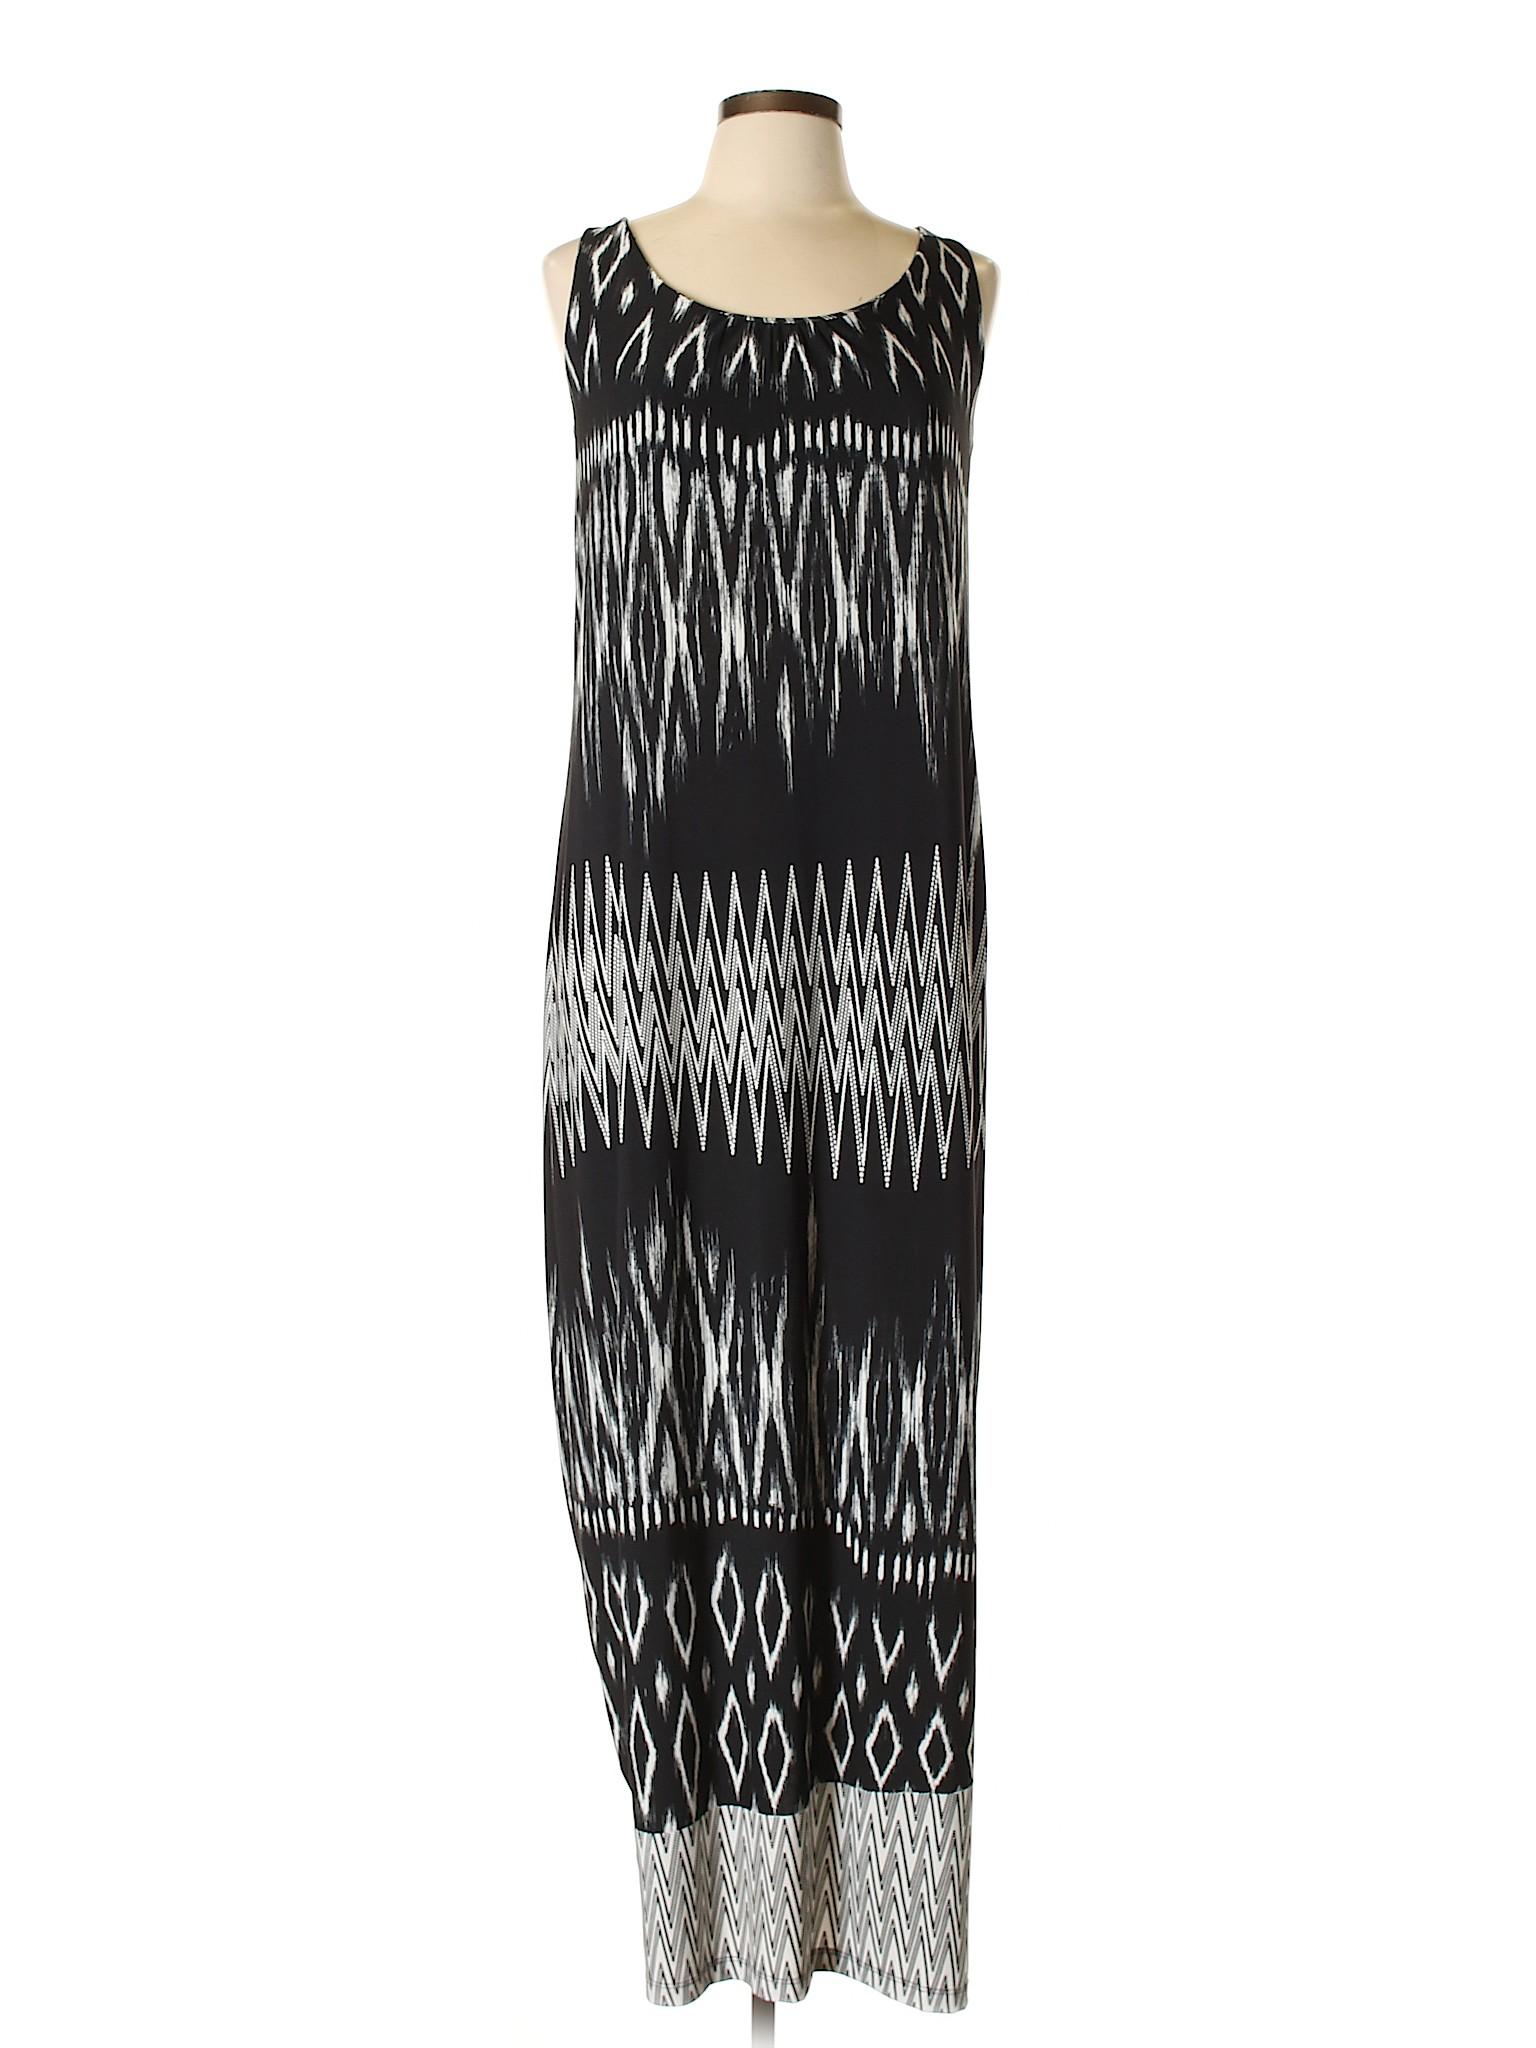 Dress SOHO Ltd Apparel Selling Casual wPCvXdqv7W